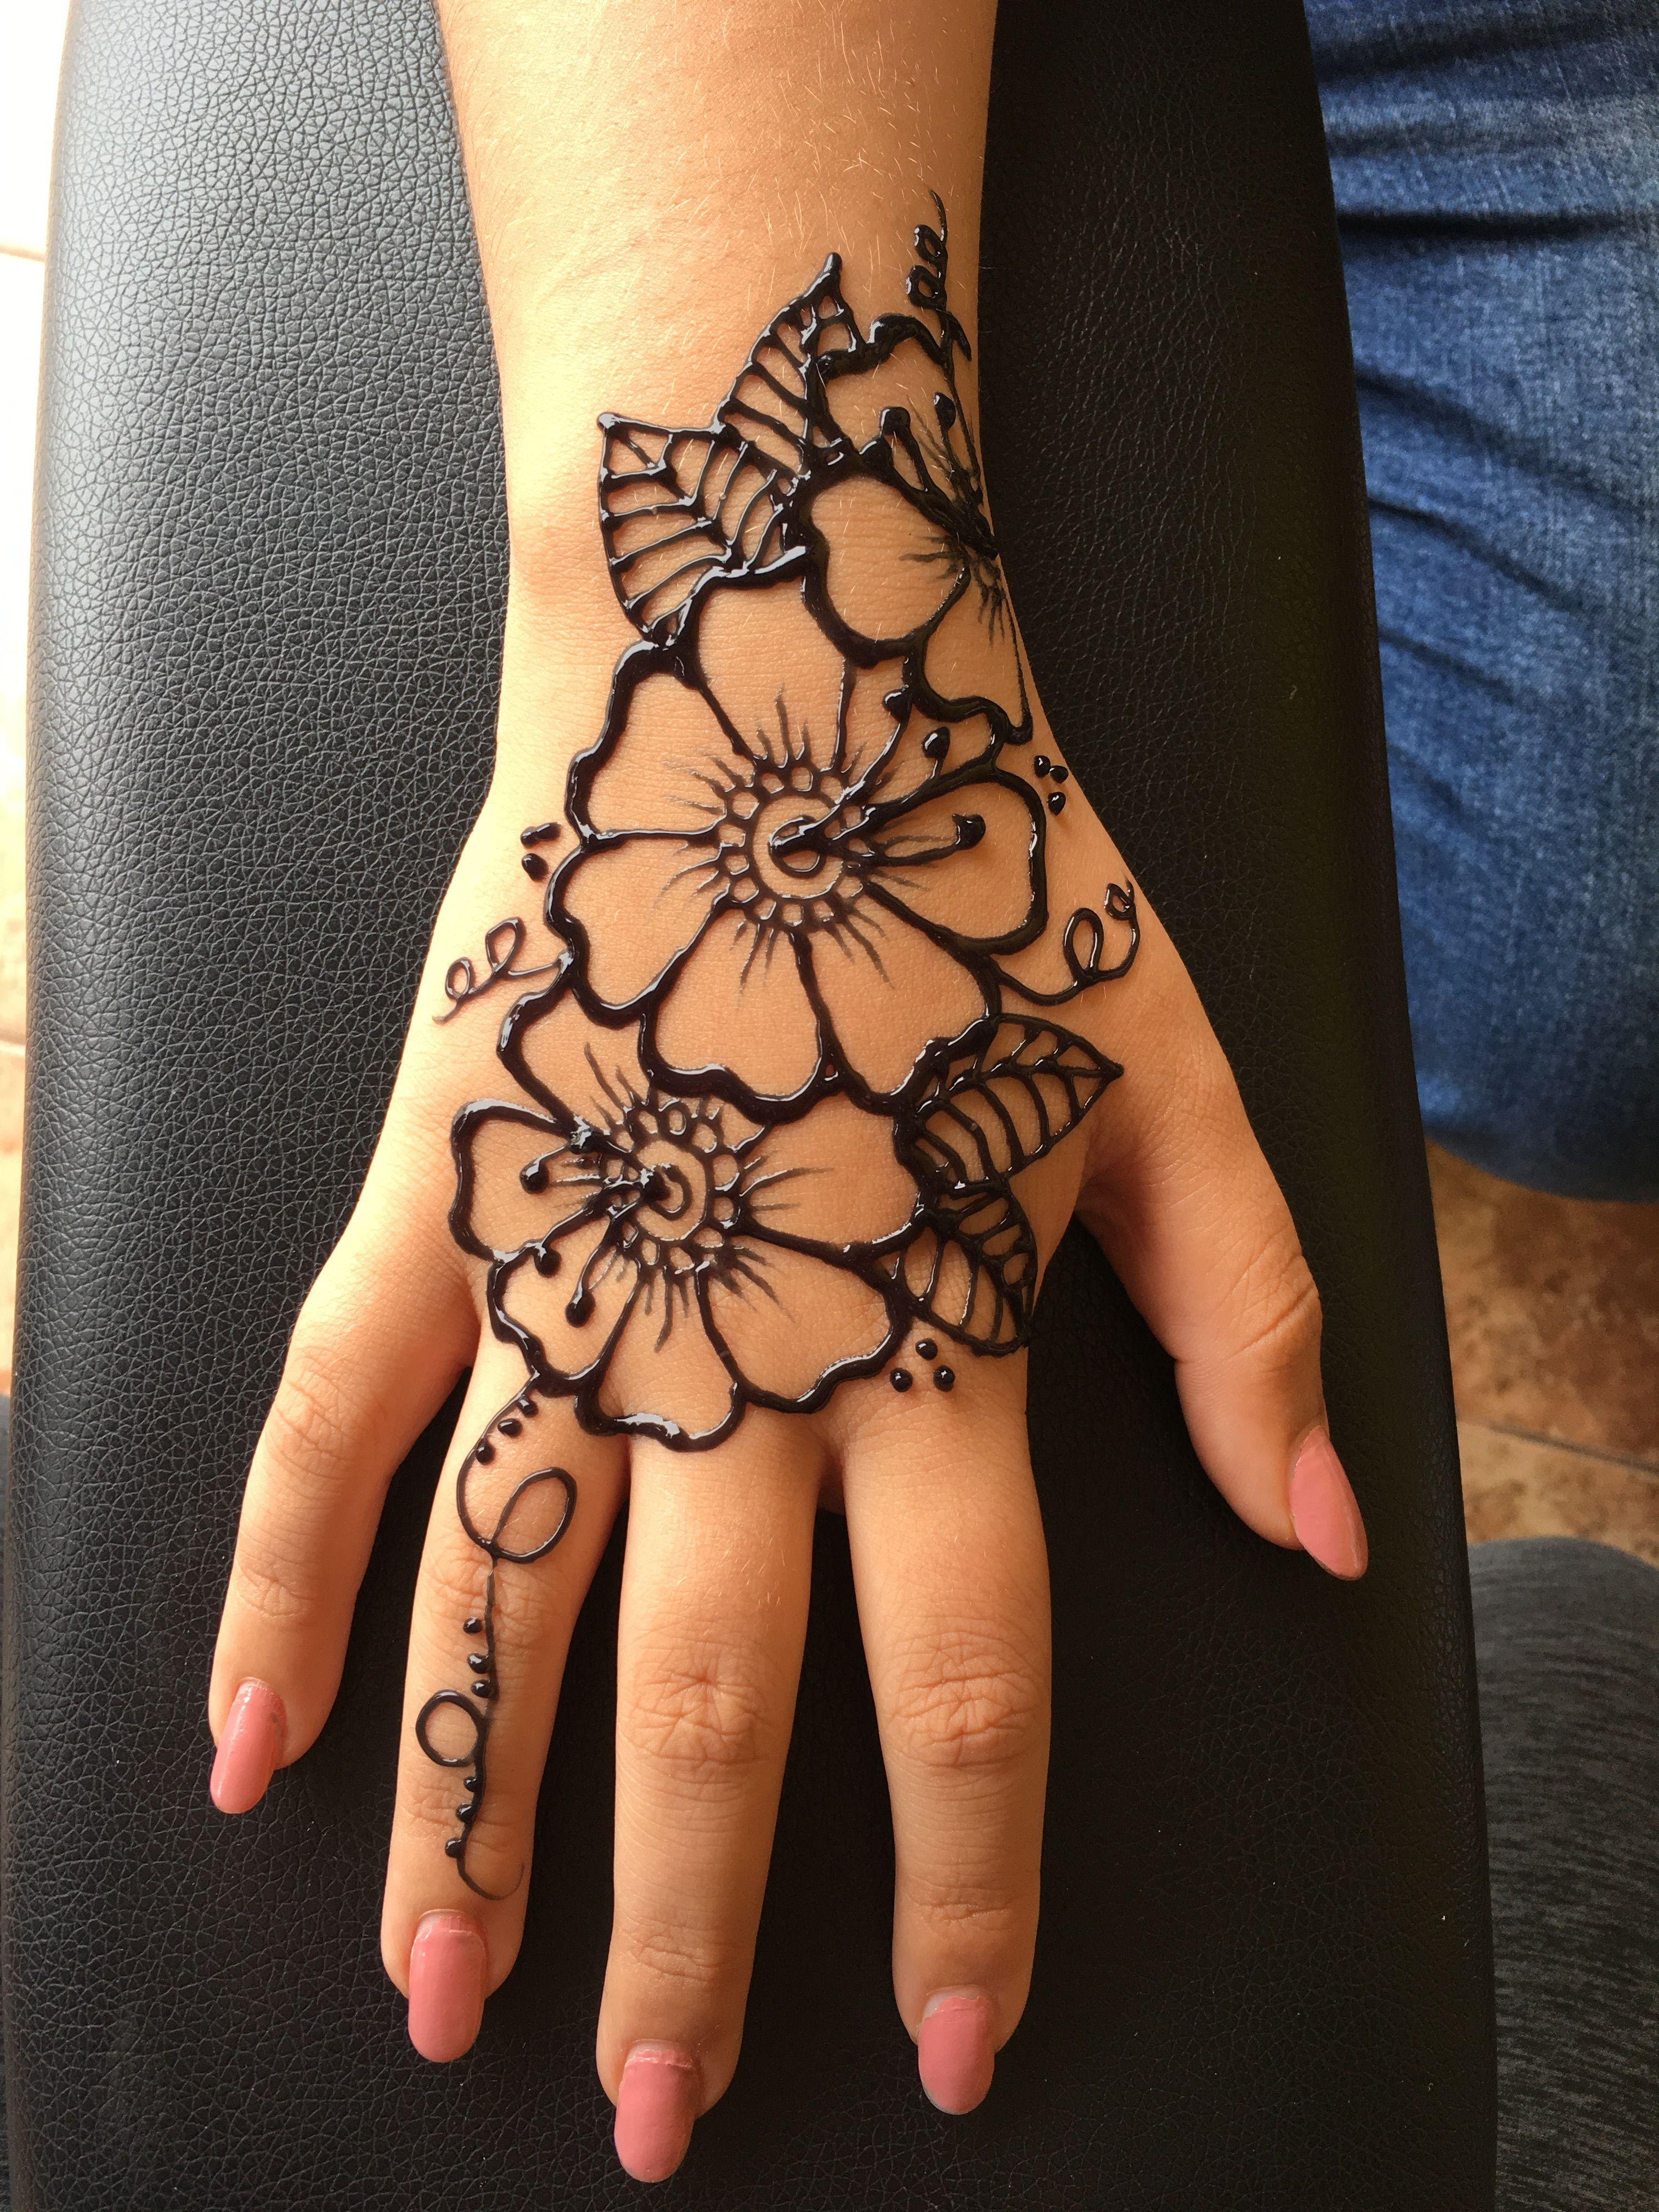 Wildwood Henna Hennadesign Loverocktattoo Wildwoodnj Henna Tattoo Designs Simple Simple Henna Tattoo Henna Tattoo Hand